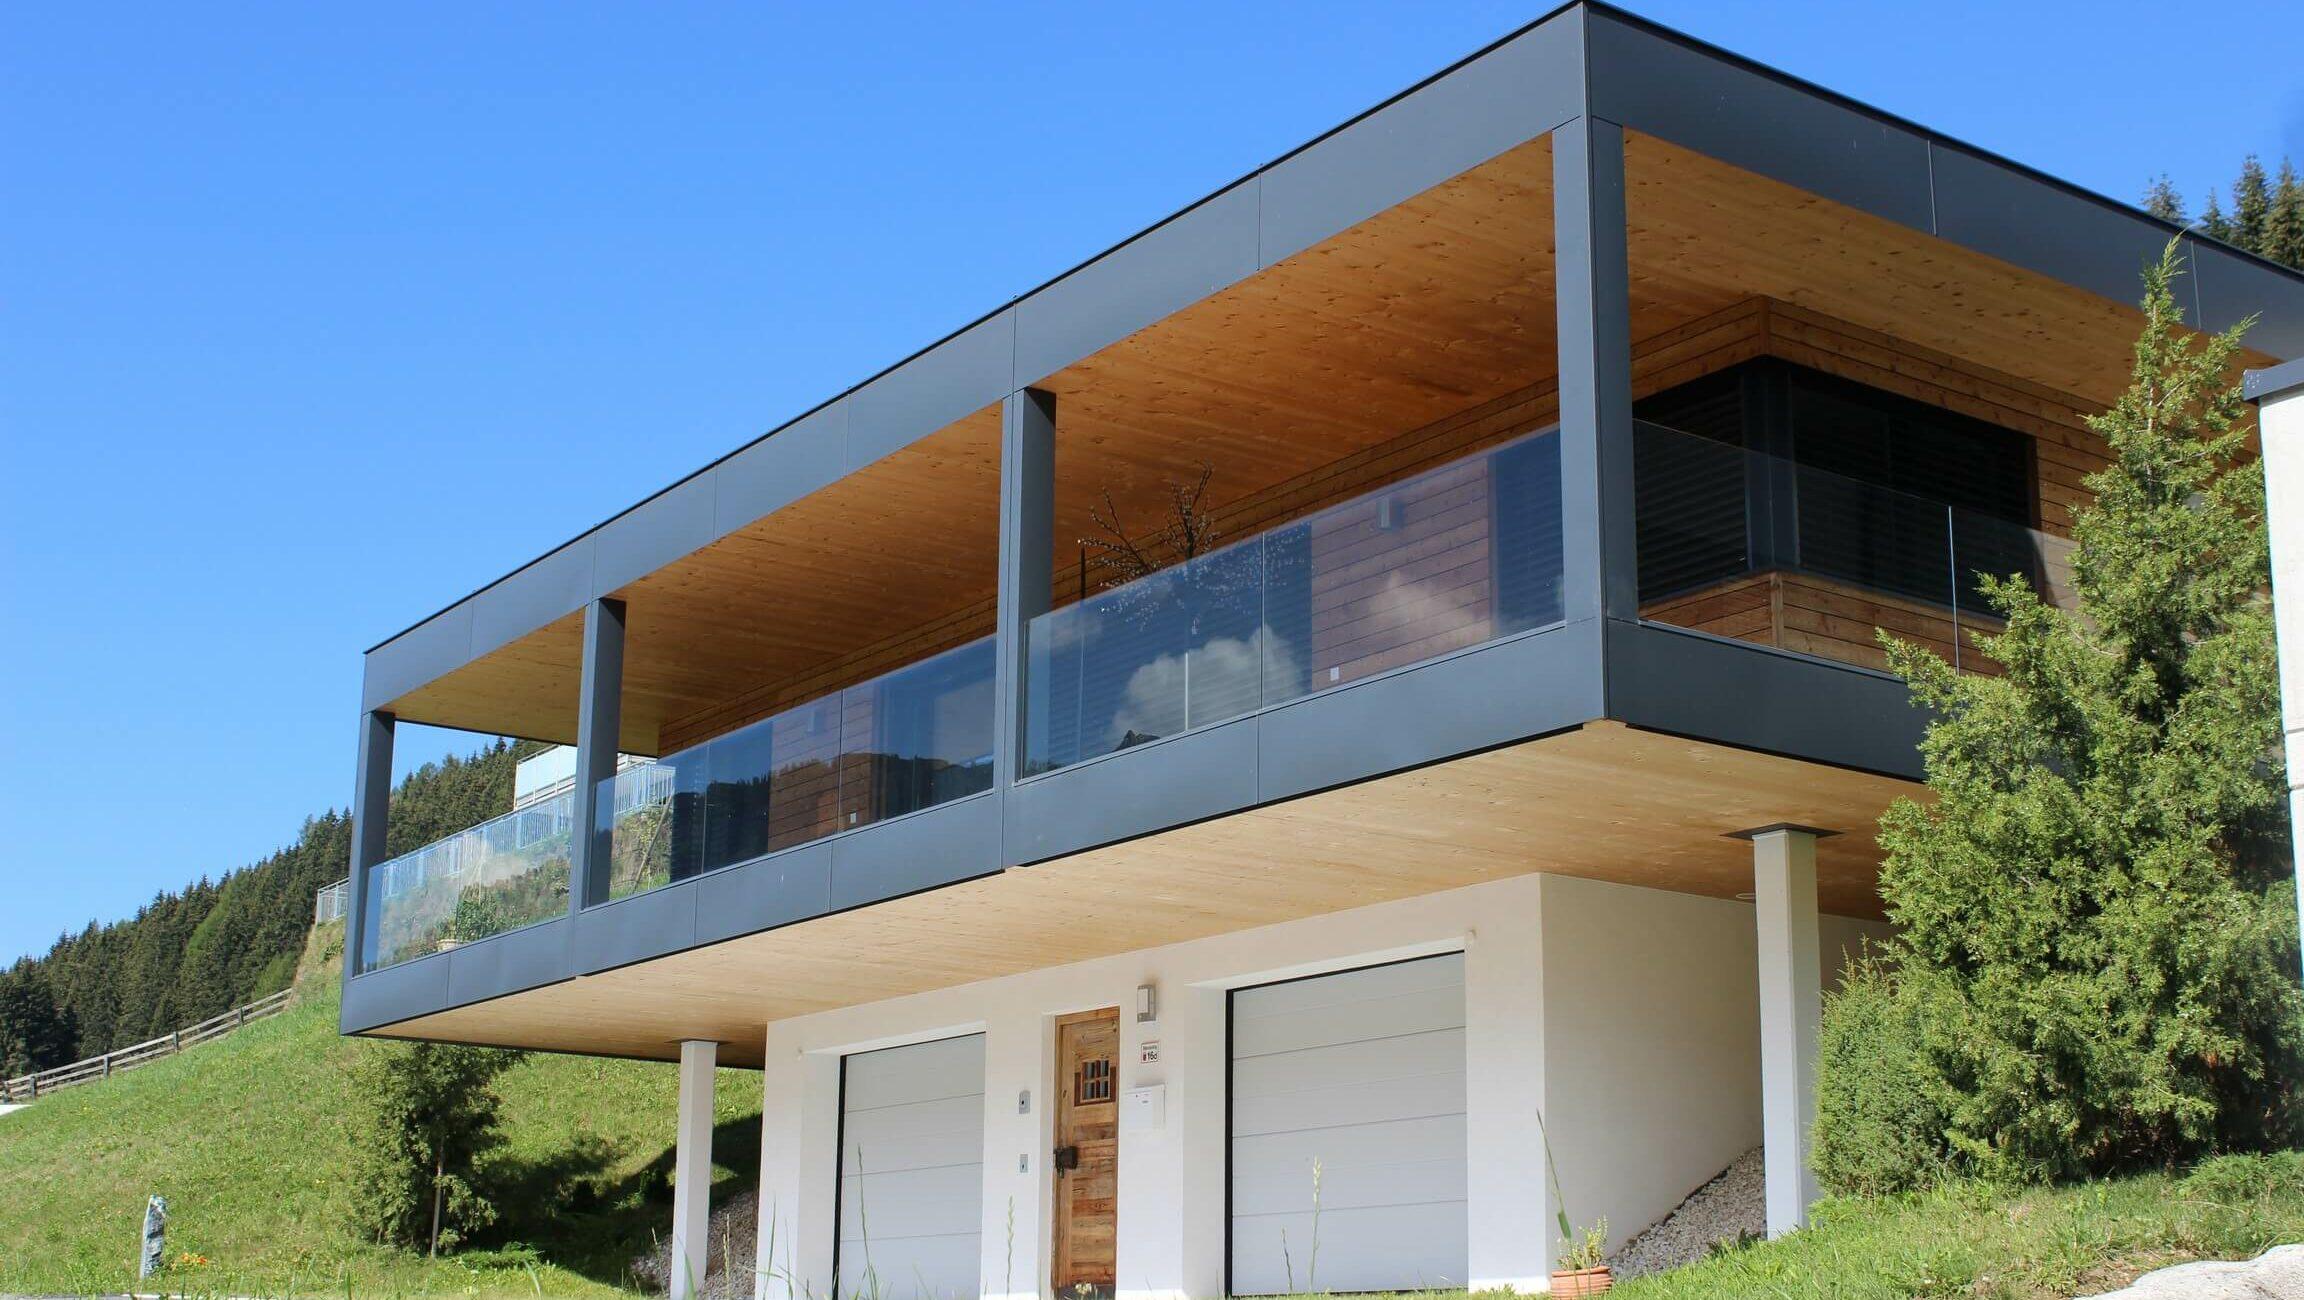 Holzbau-Unterrainer-Familienhaus-07-04